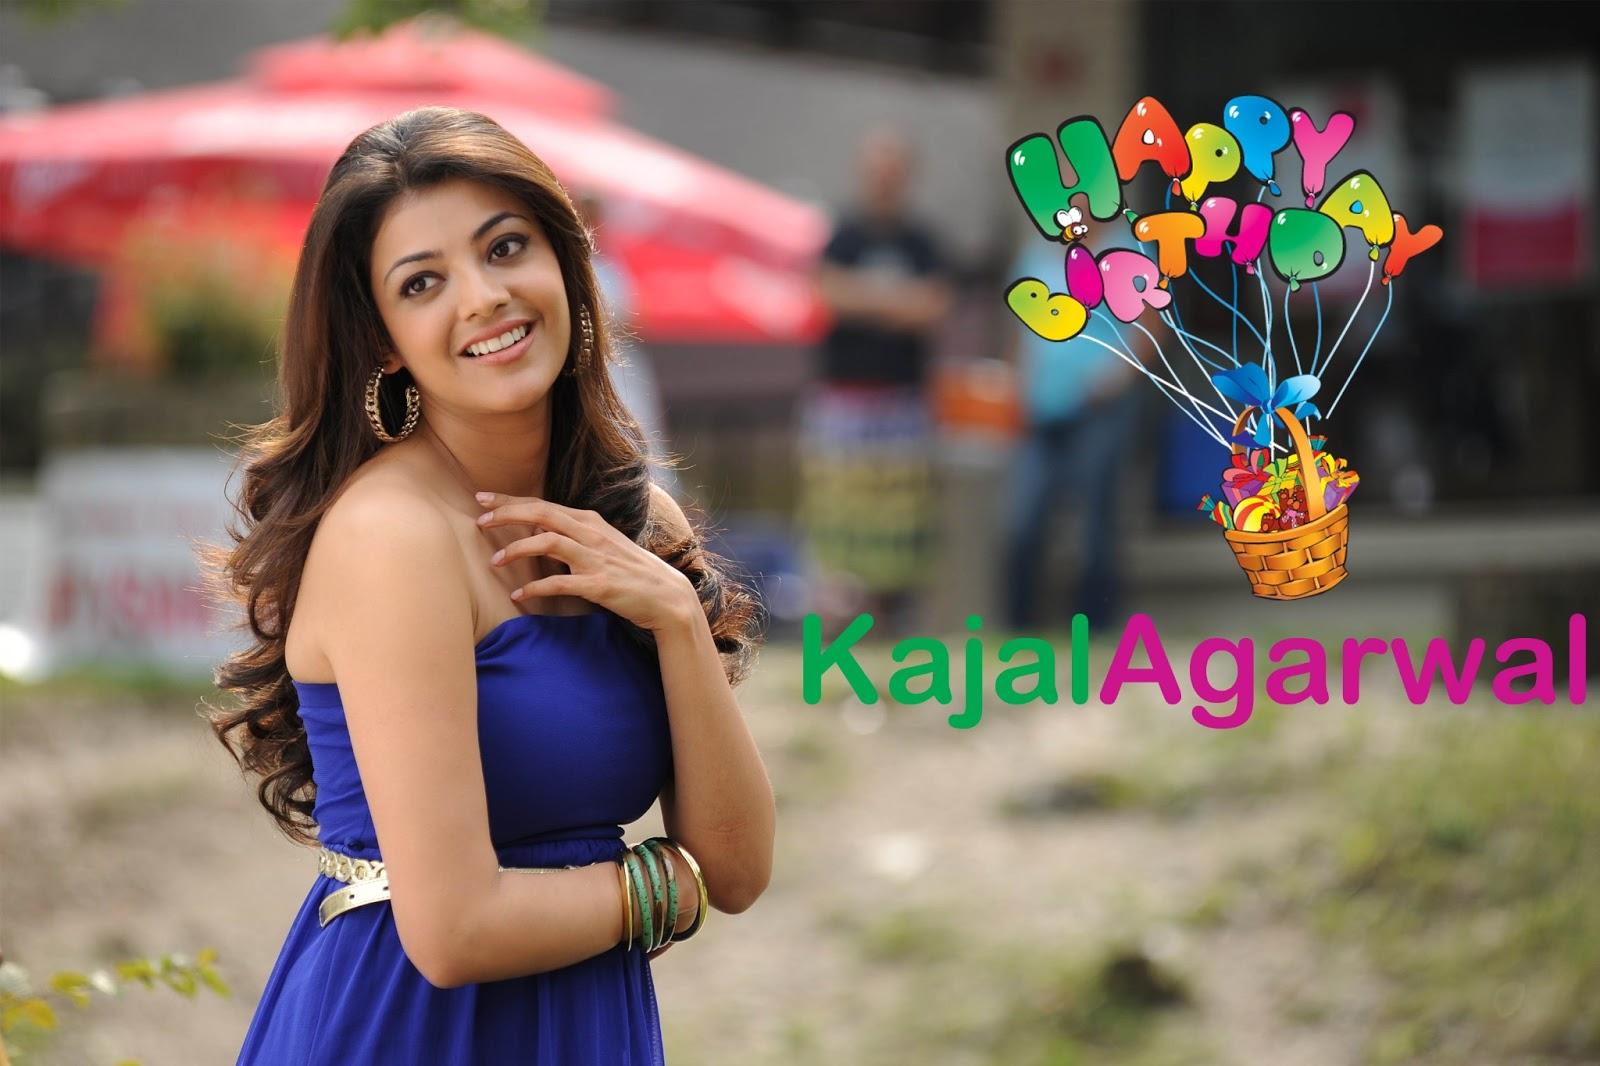 happy birthday to kajal agarwal - june 19 | hd wallpapers (high